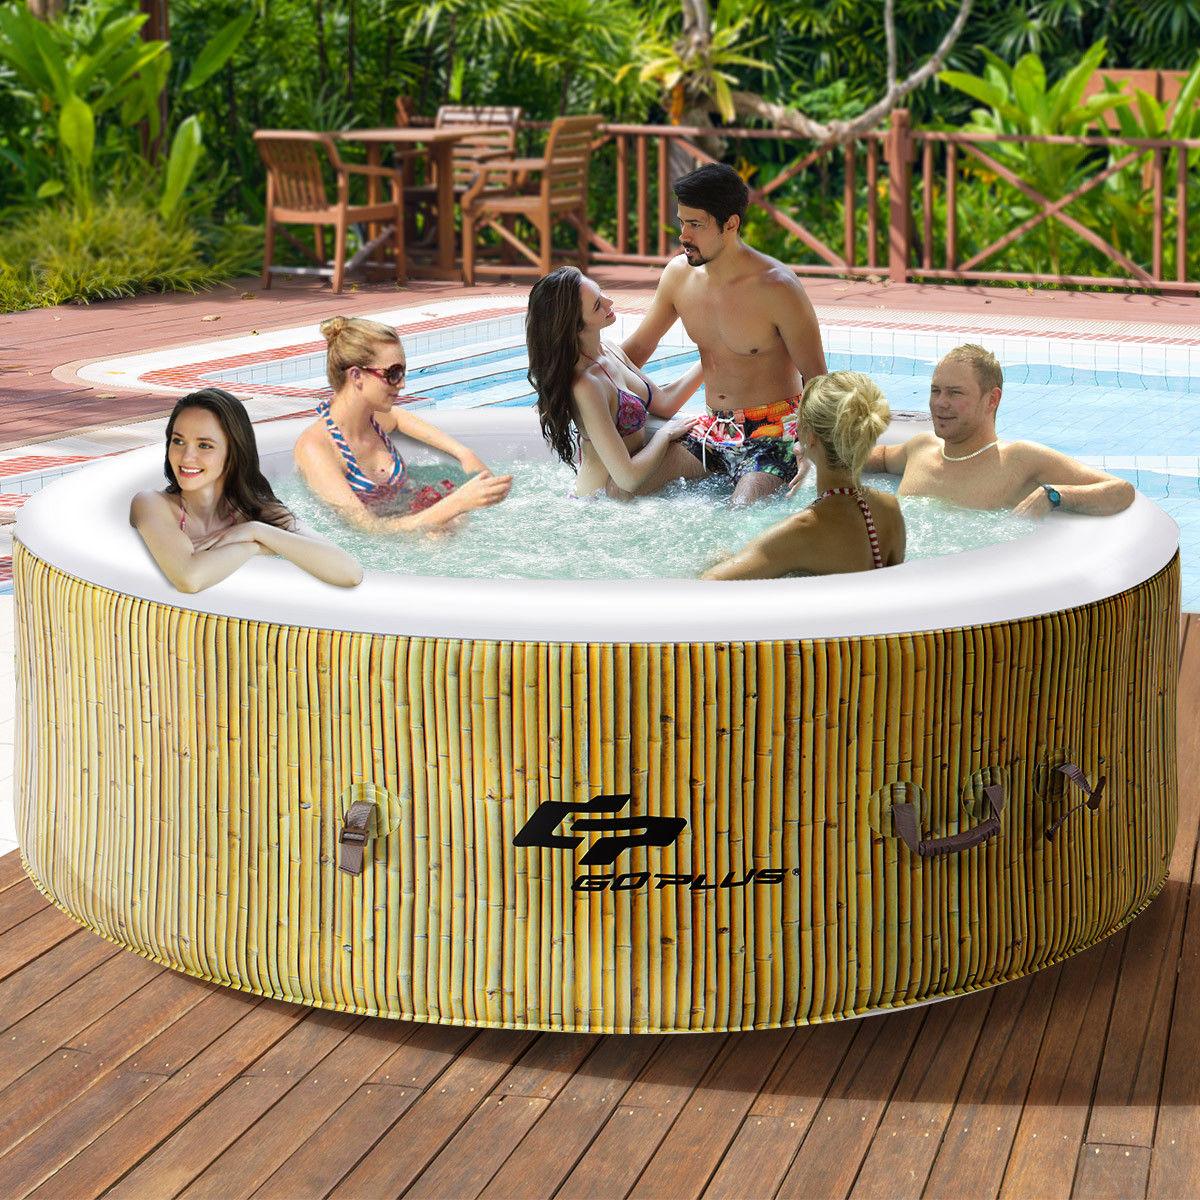 b5d8952f6c2 Hot Tubs and Saunas